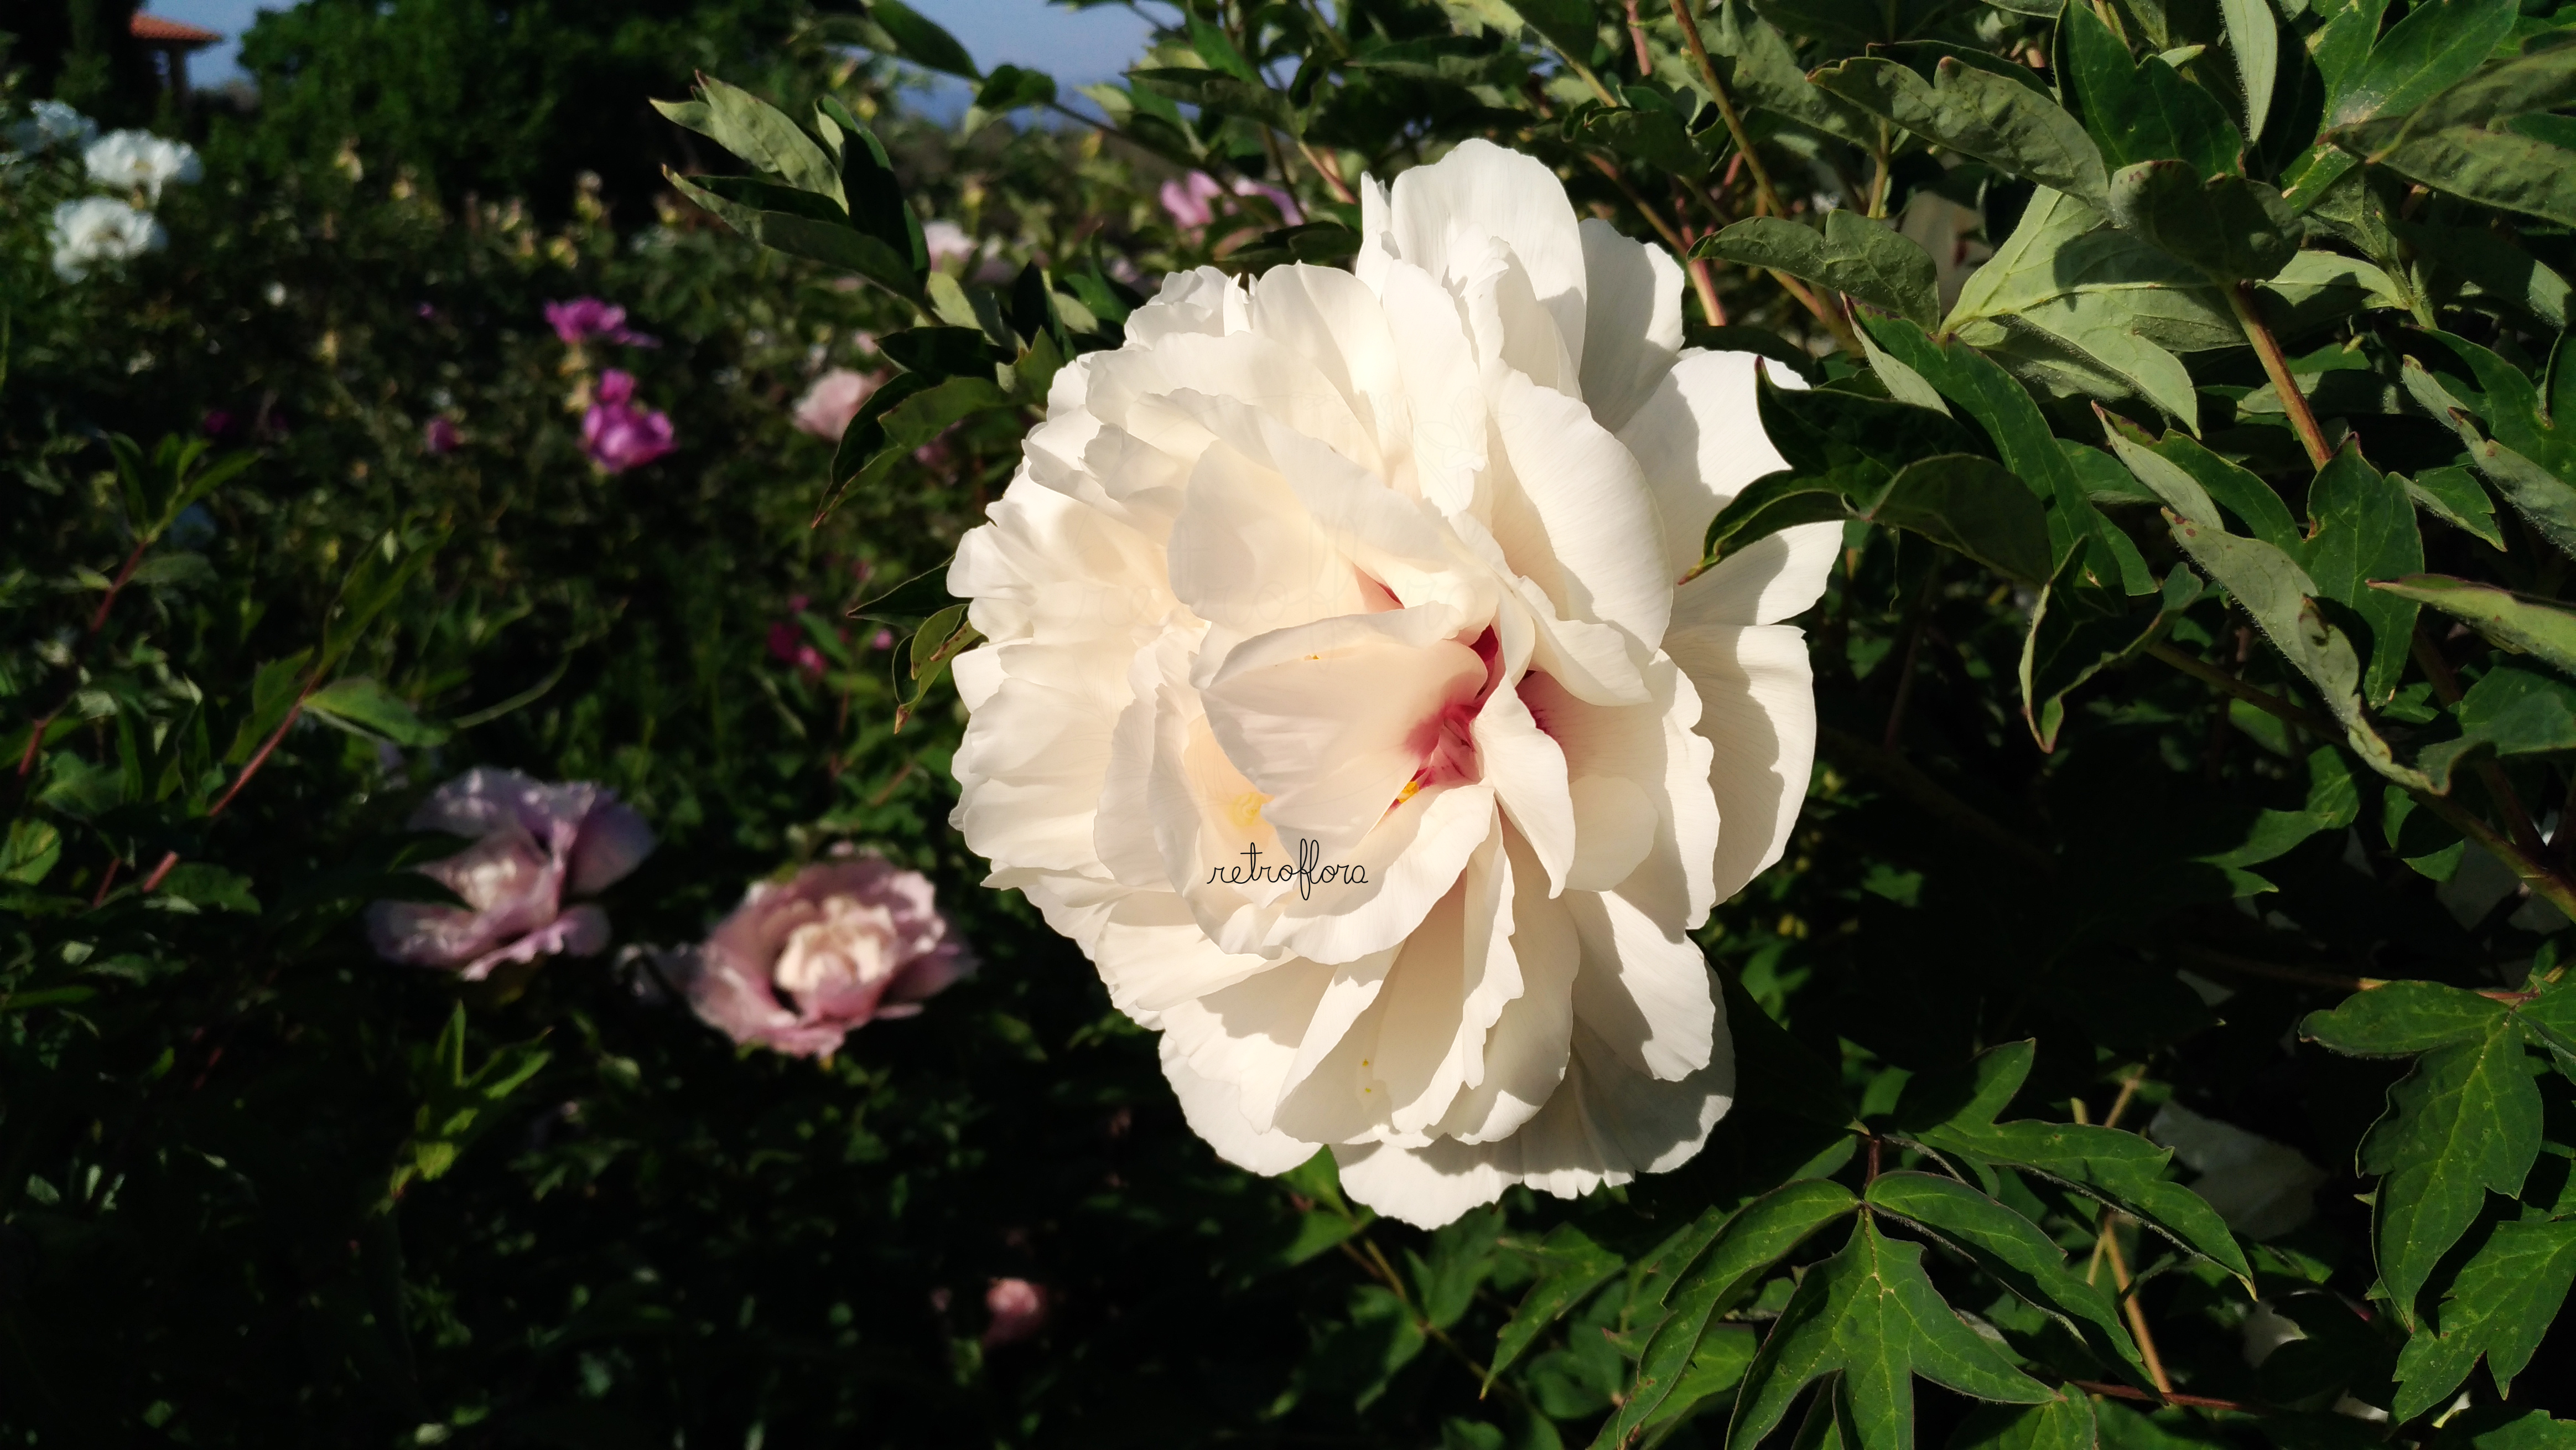 Hanami delle Peonie Parte 2, Peonia, Peonia Arbustiva, Peonia Arborea, Peonia Profumata, Peony